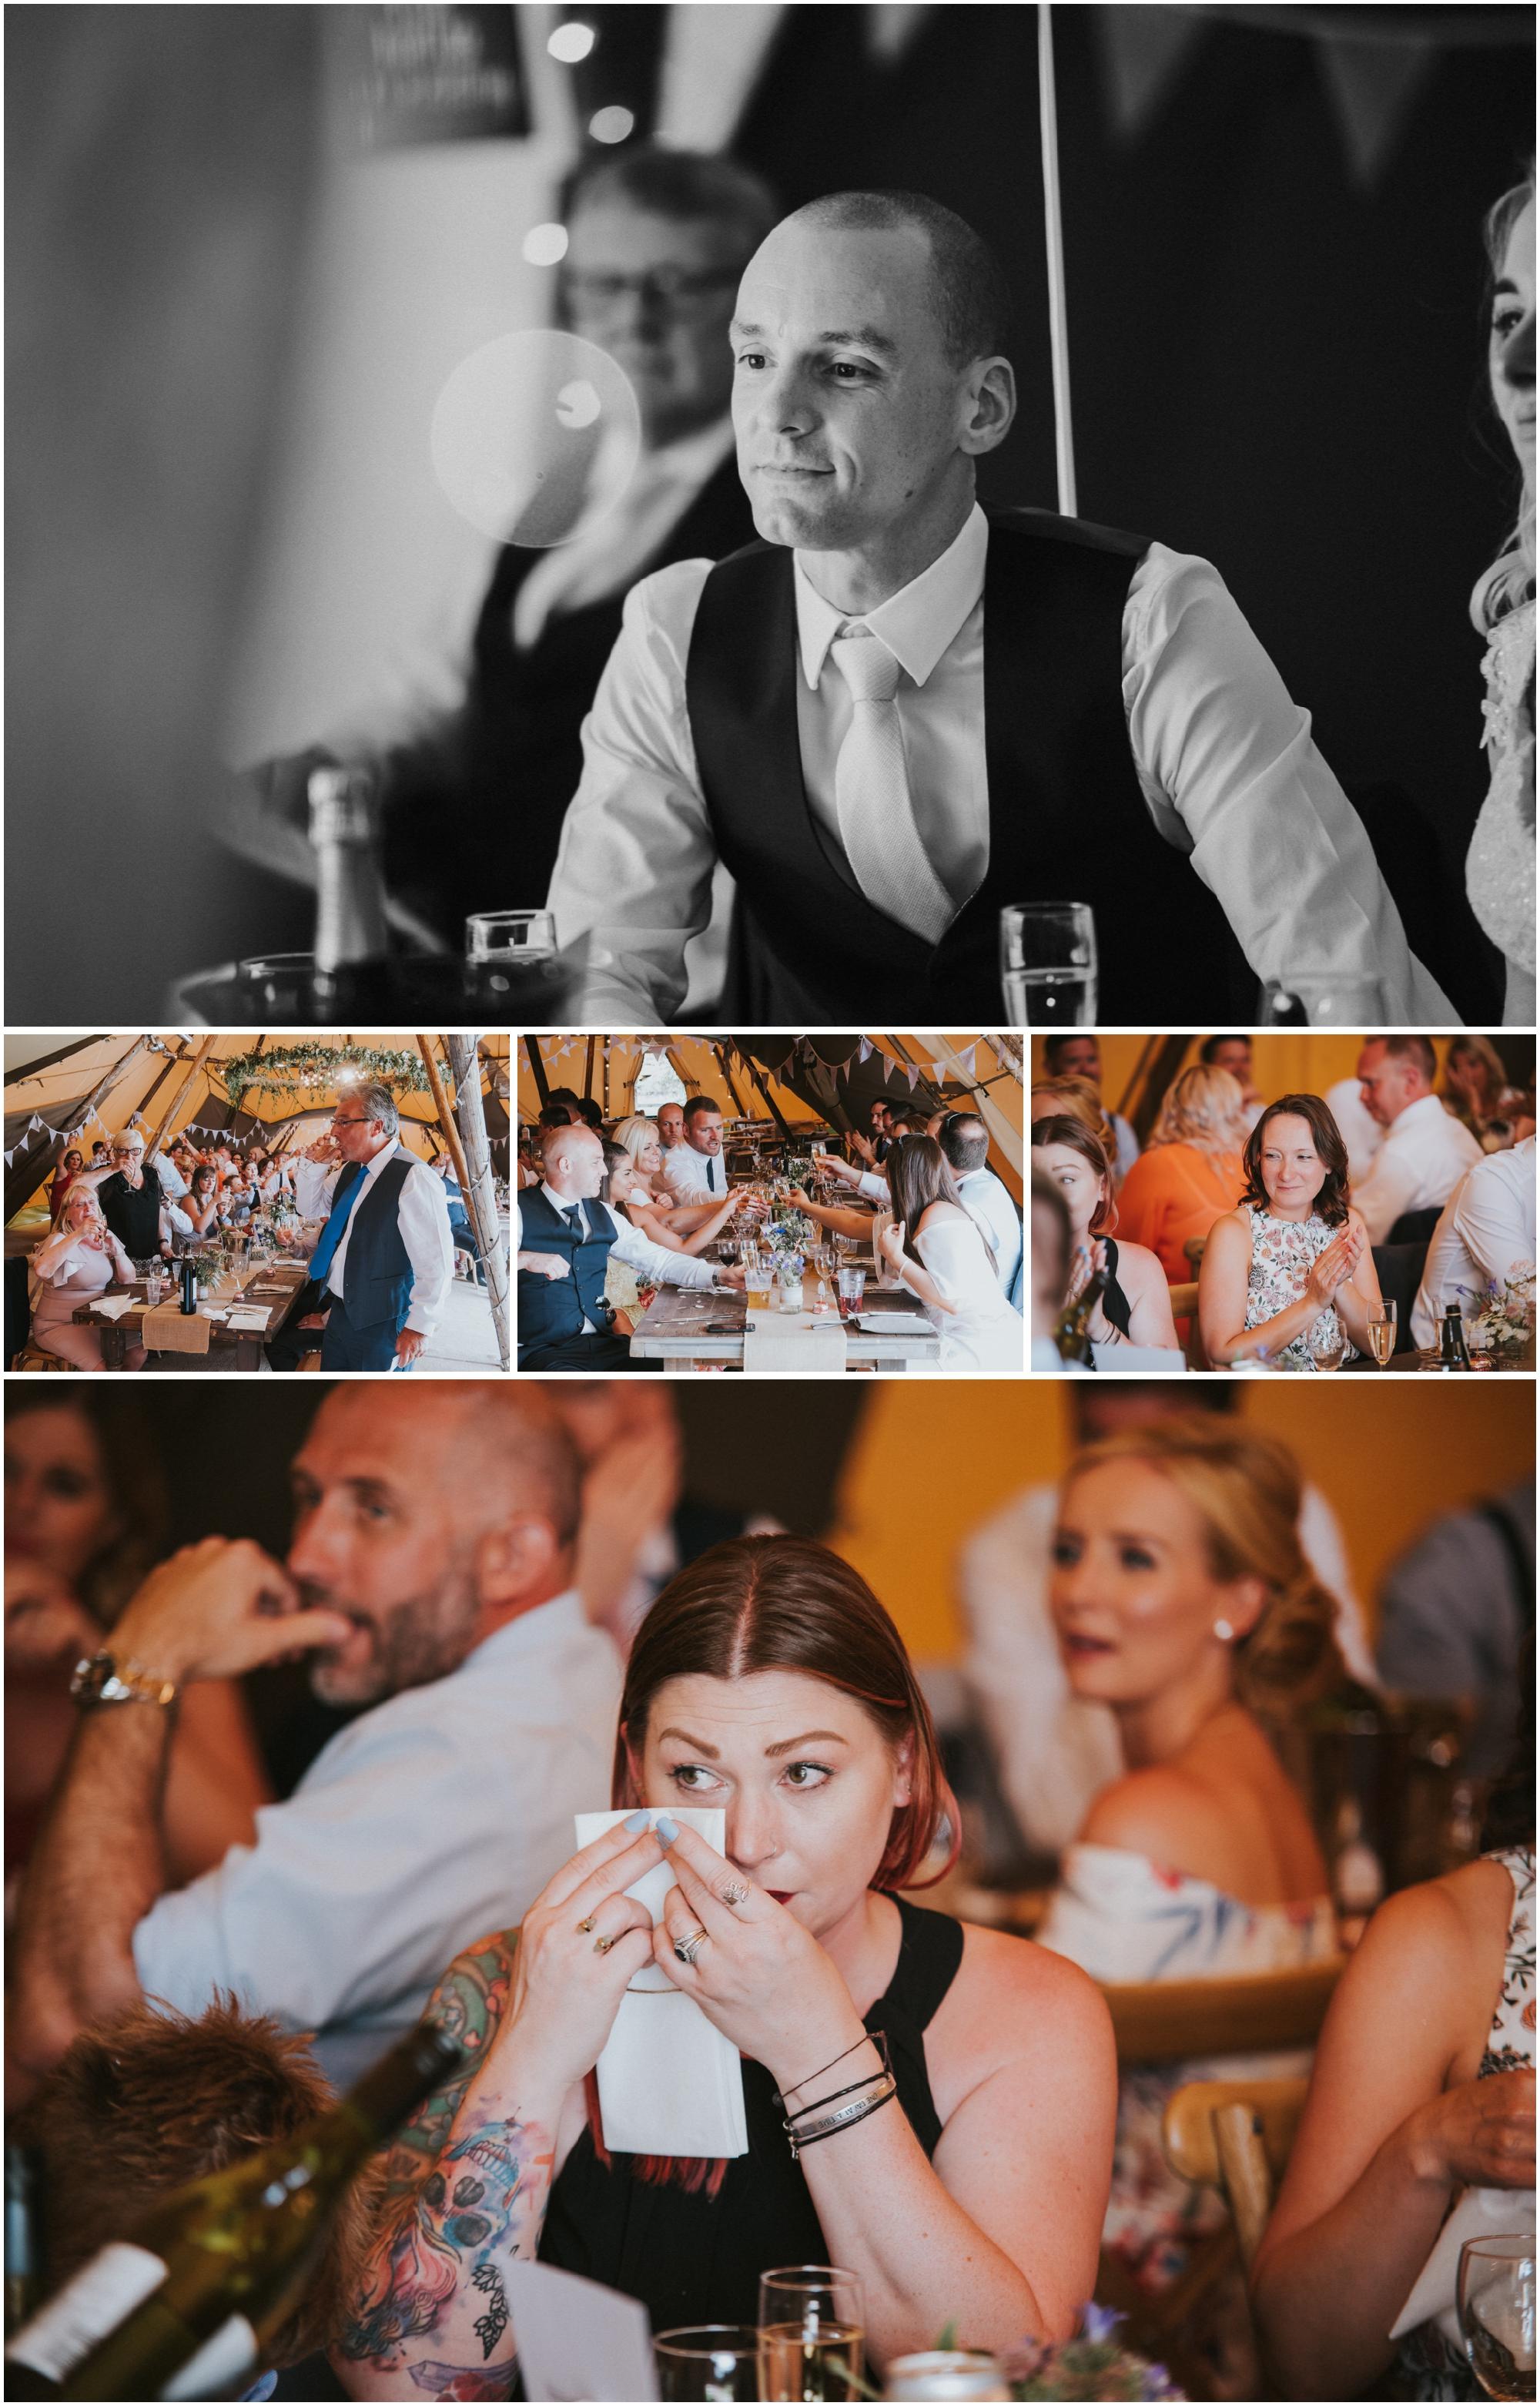 SkipbridegFarmWedding-LukeHolroyd-Yorkshirewedding_0095.jpg